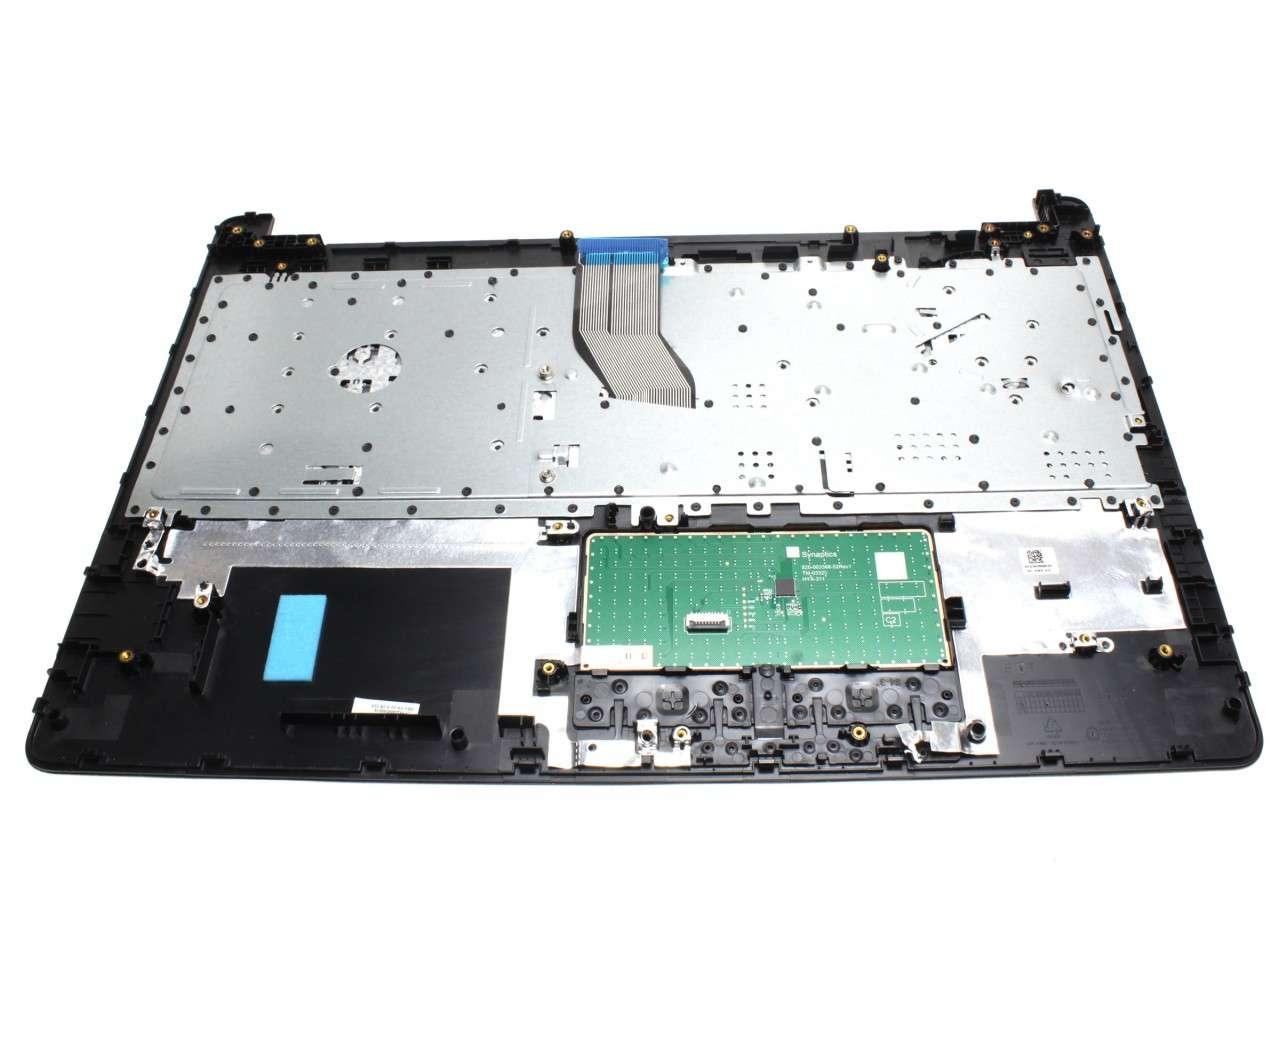 Tastatura HP 255 G6 neagra cu Palmrest negru si Touchpad imagine powerlaptop.ro 2021